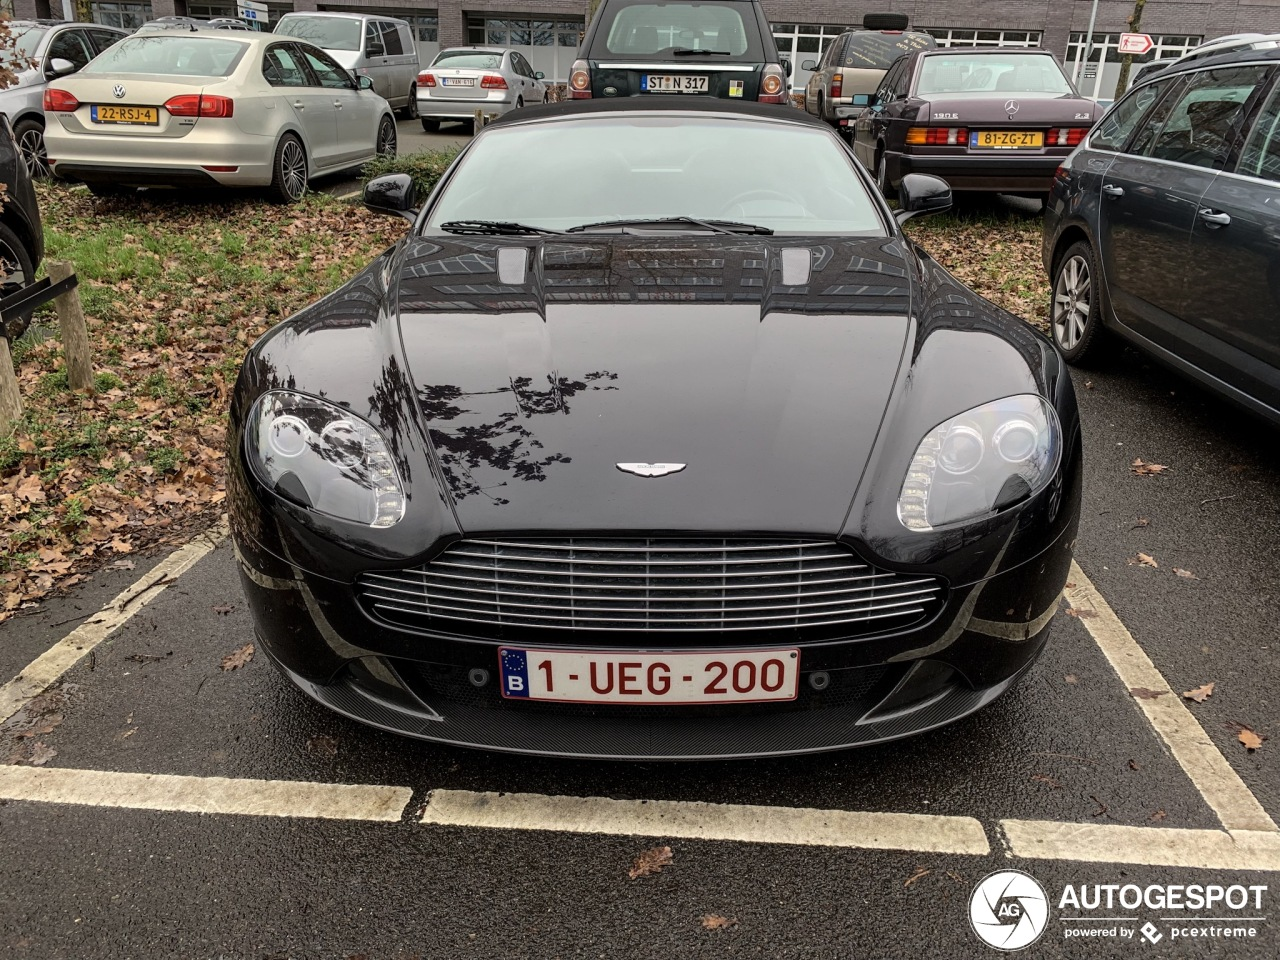 Aston Martin V8 Vantage S Roadster - 12 January 2019